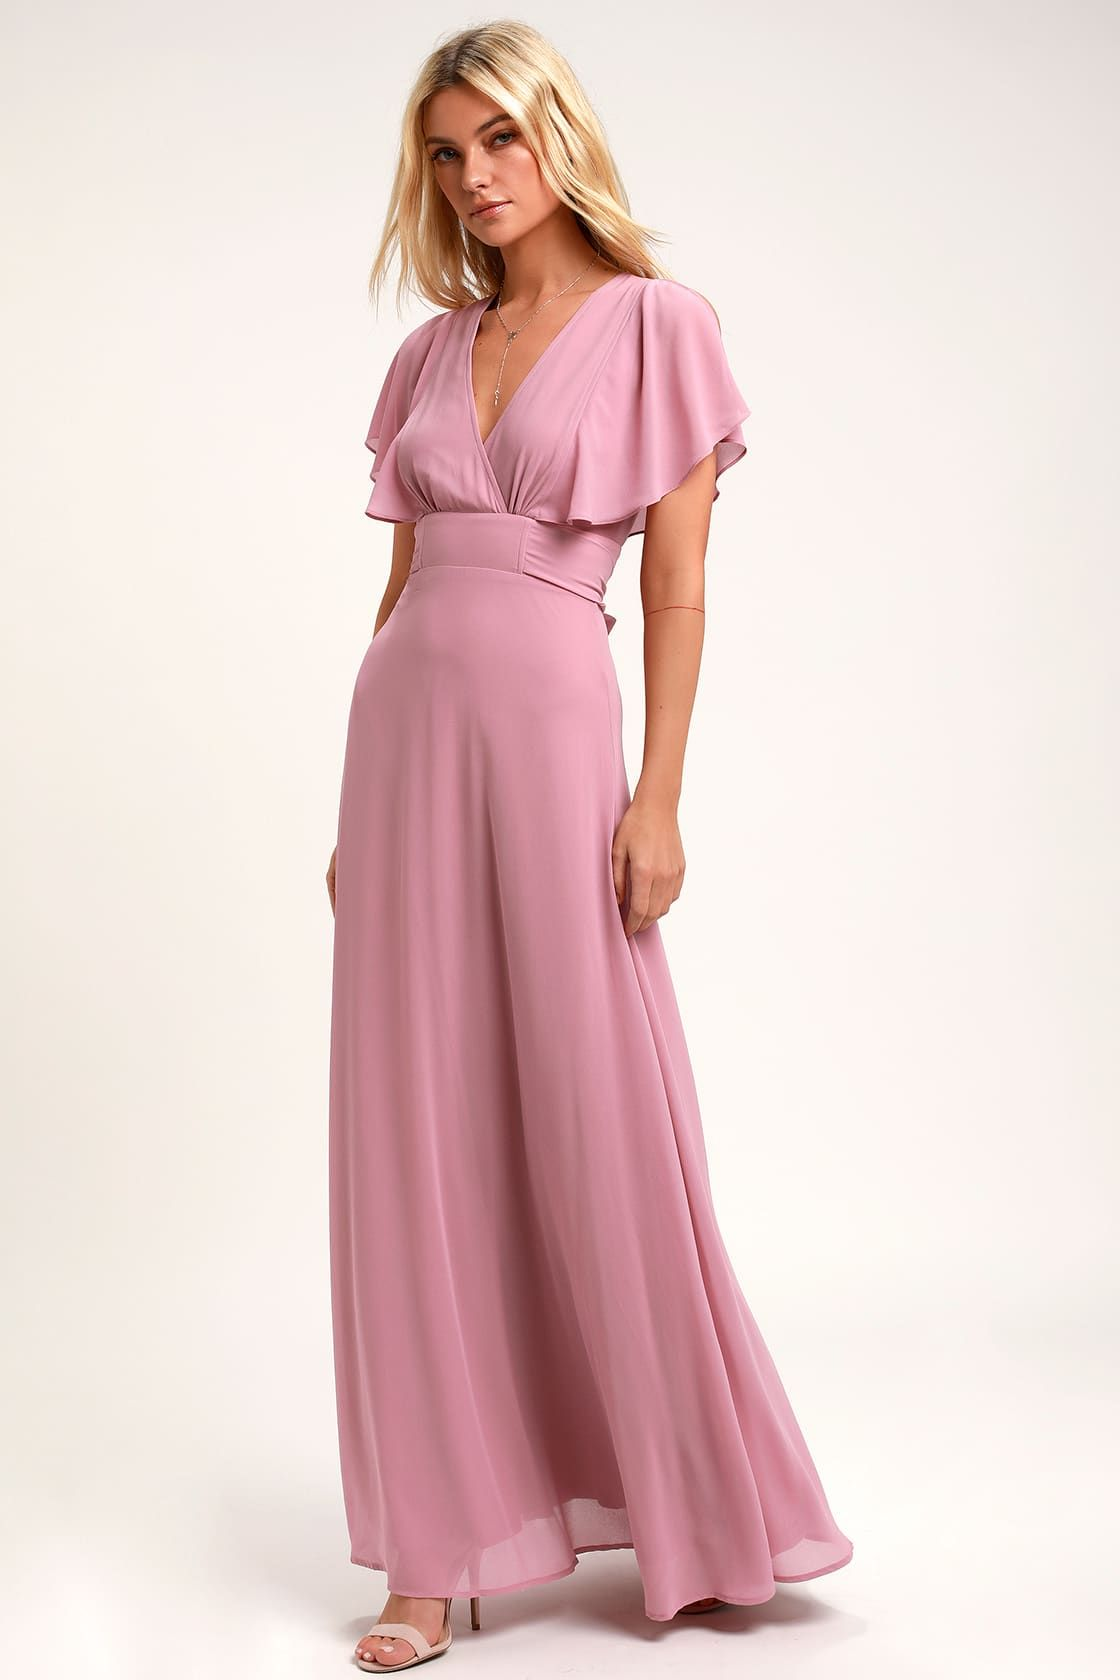 Dearly loved mauve flutter sleeve maxi dress maxi dress